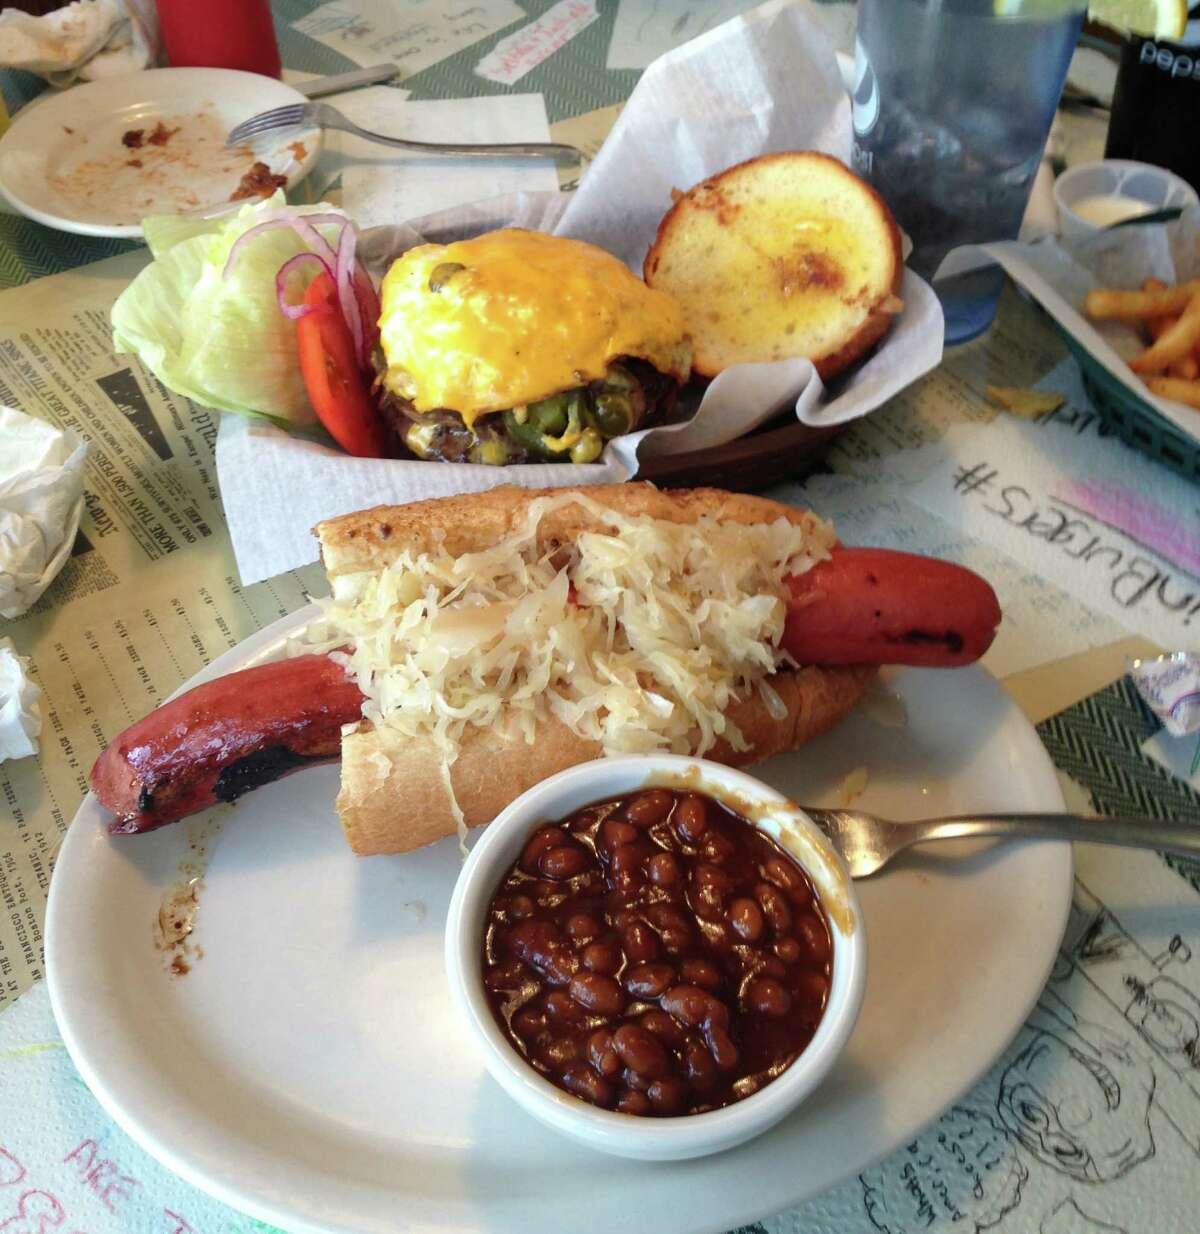 9. Brook's Gourmet Burgers and Dogs - Naples, Florida (874 reviews on TripAdvisor)